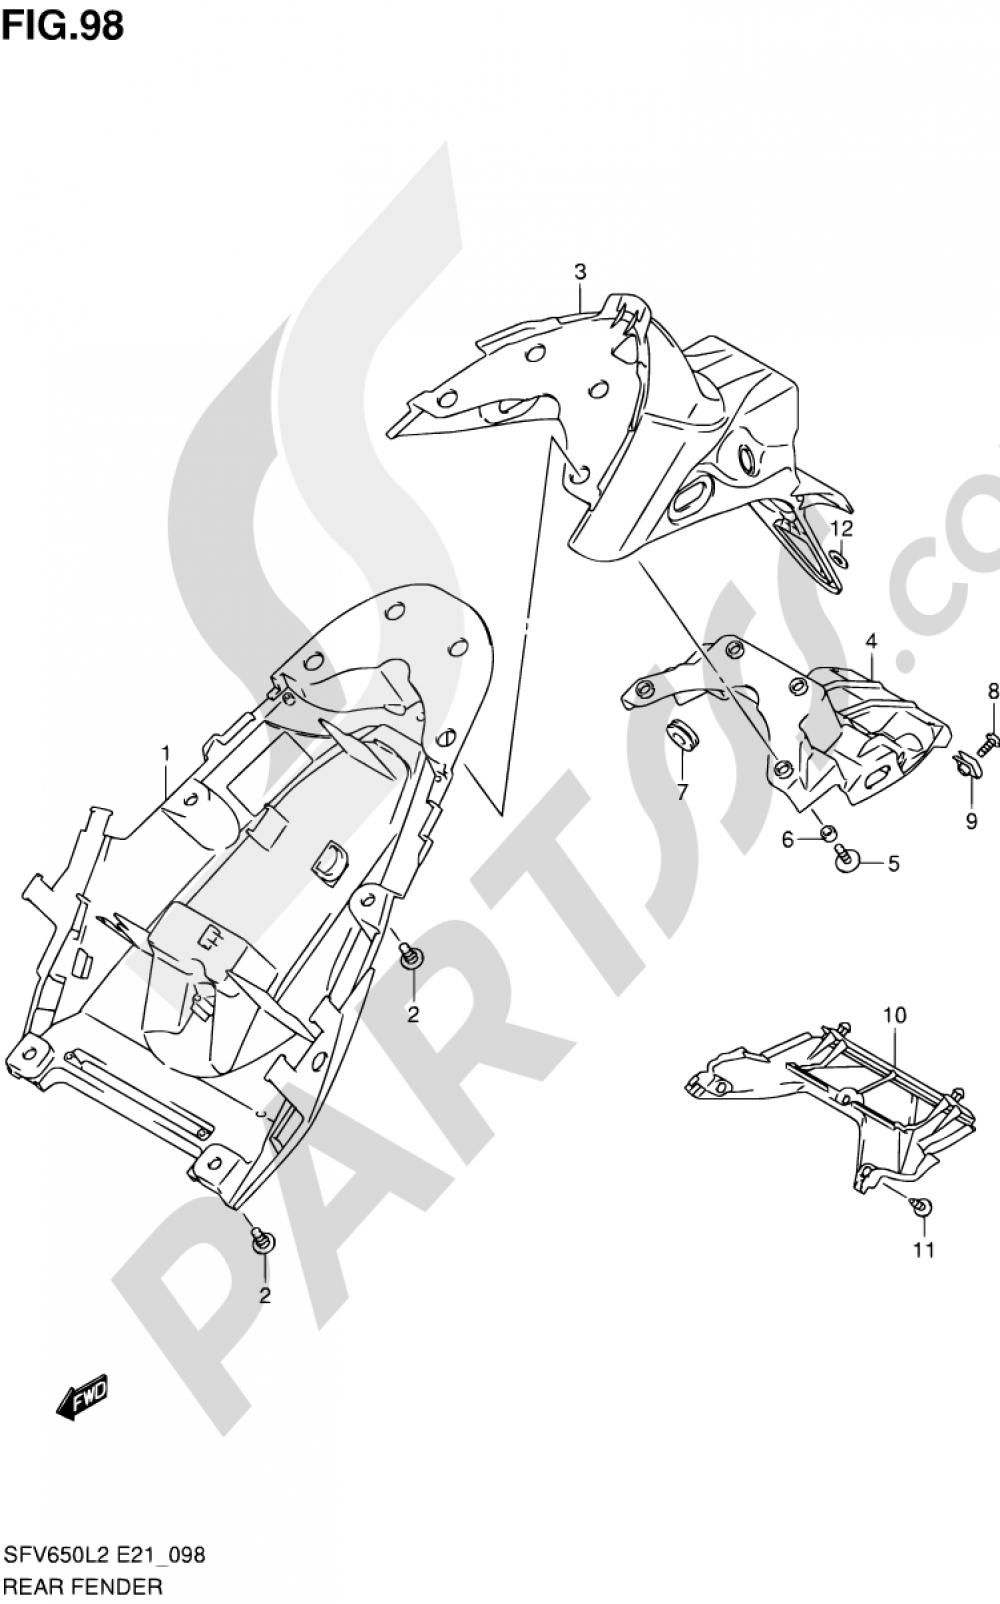 98 - REAR FENDER (SFV650UL2 E21) Suzuki GLADIUS SFV650A 2012